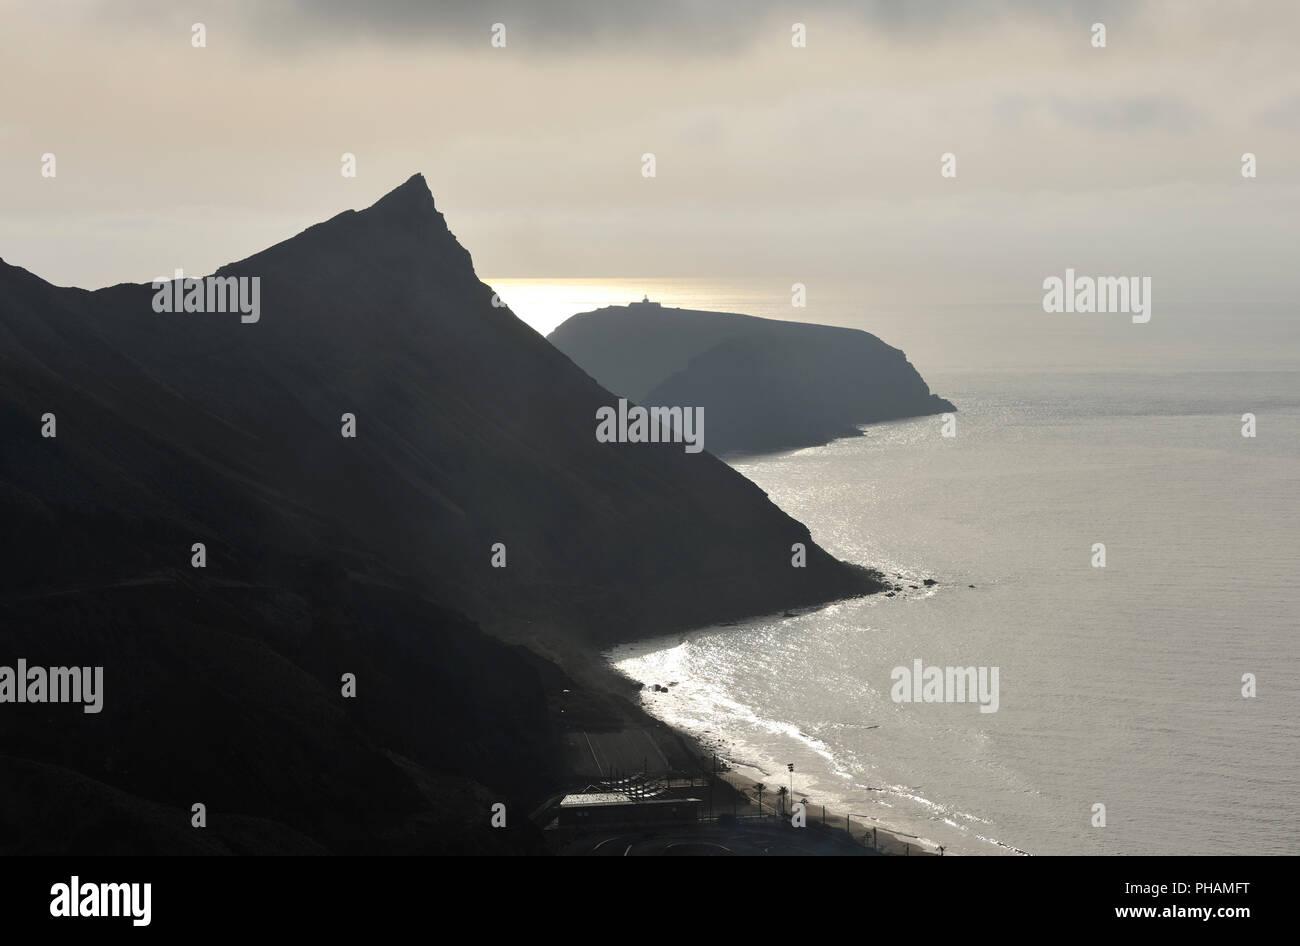 Ilhéu de Cima. Porto Santo island, Madeira. Portugal - Stock Image